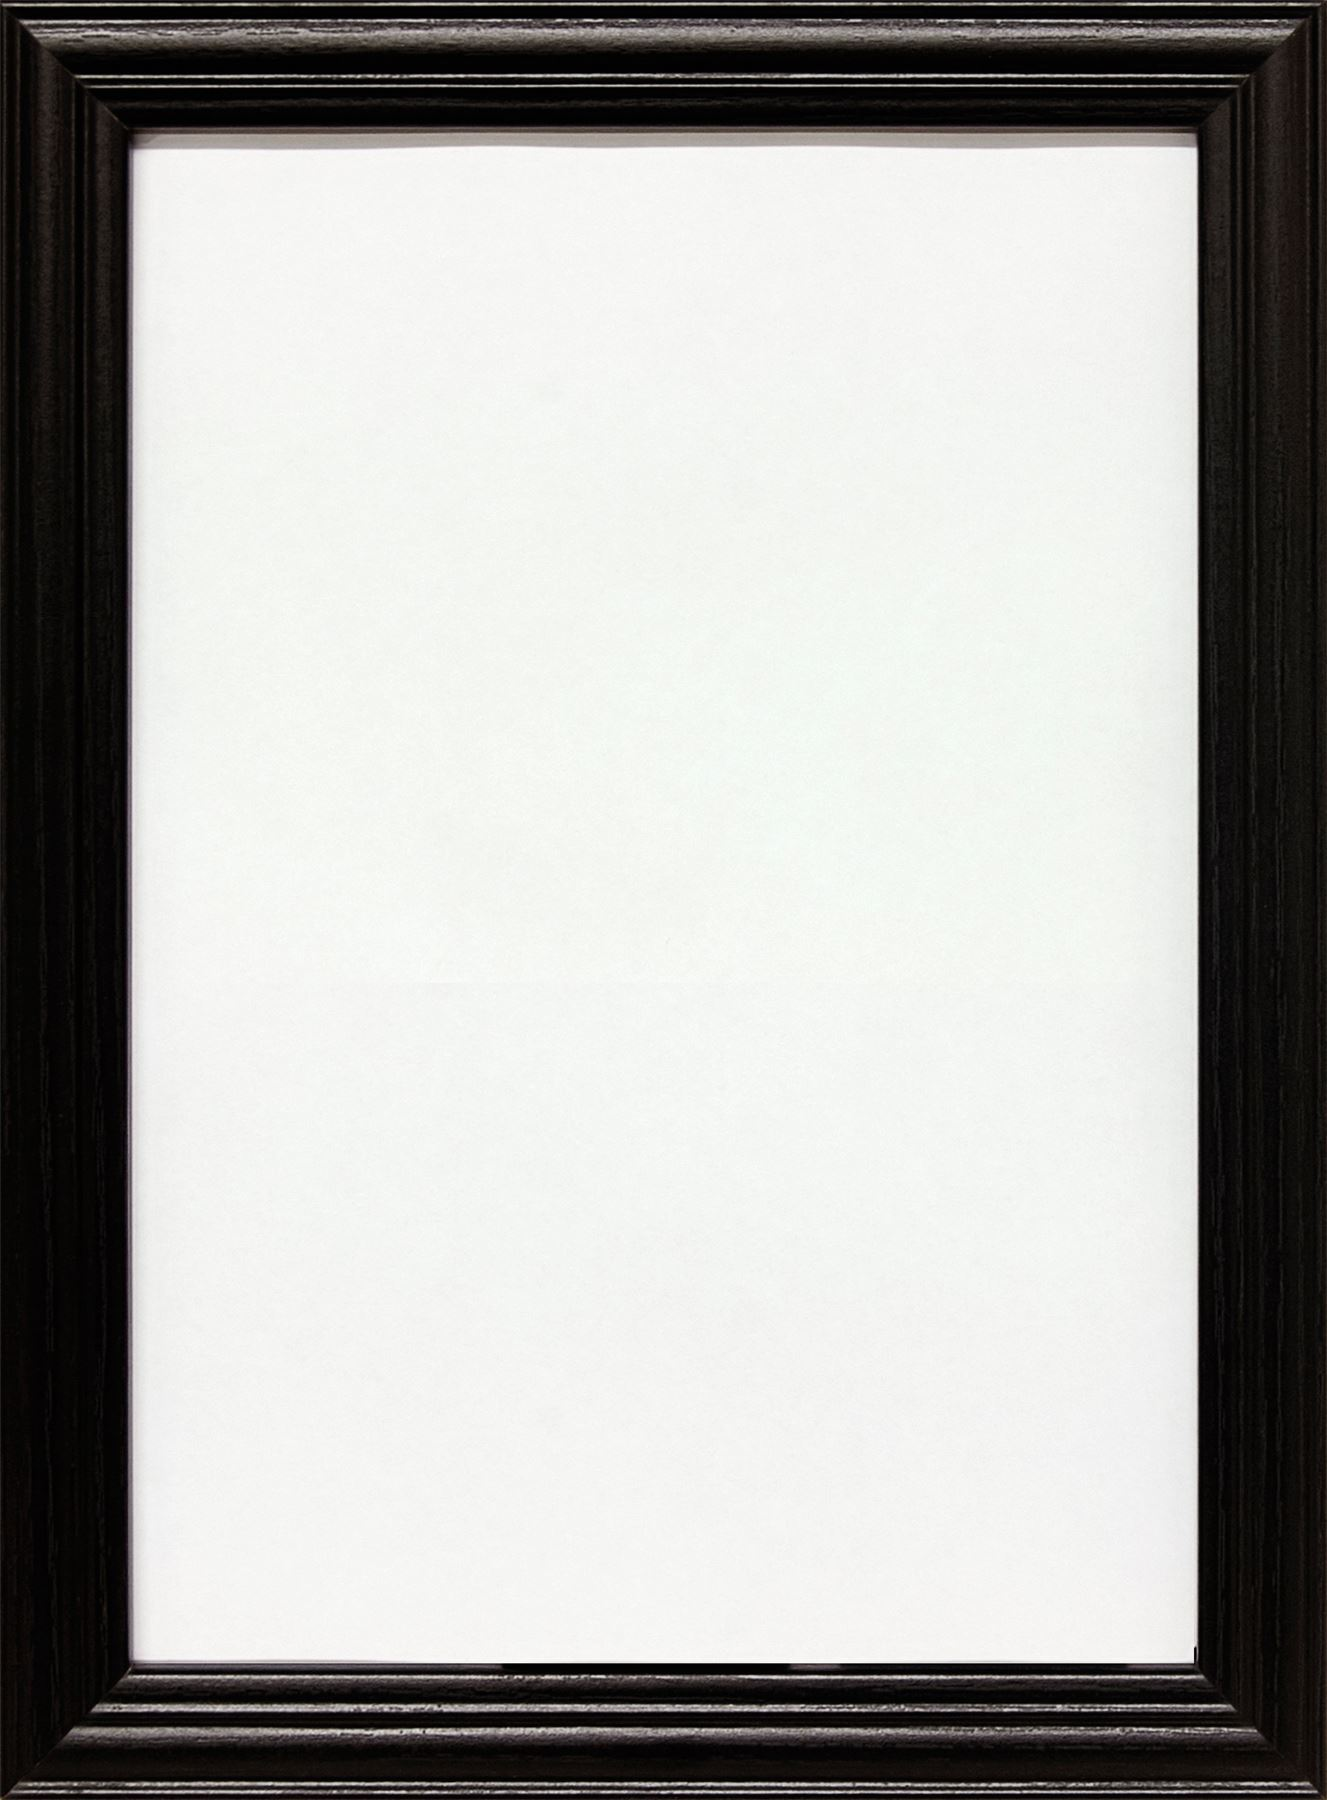 Wood Wooden Picture Photo Frame Thin Moulding Black,white,oak   eBay